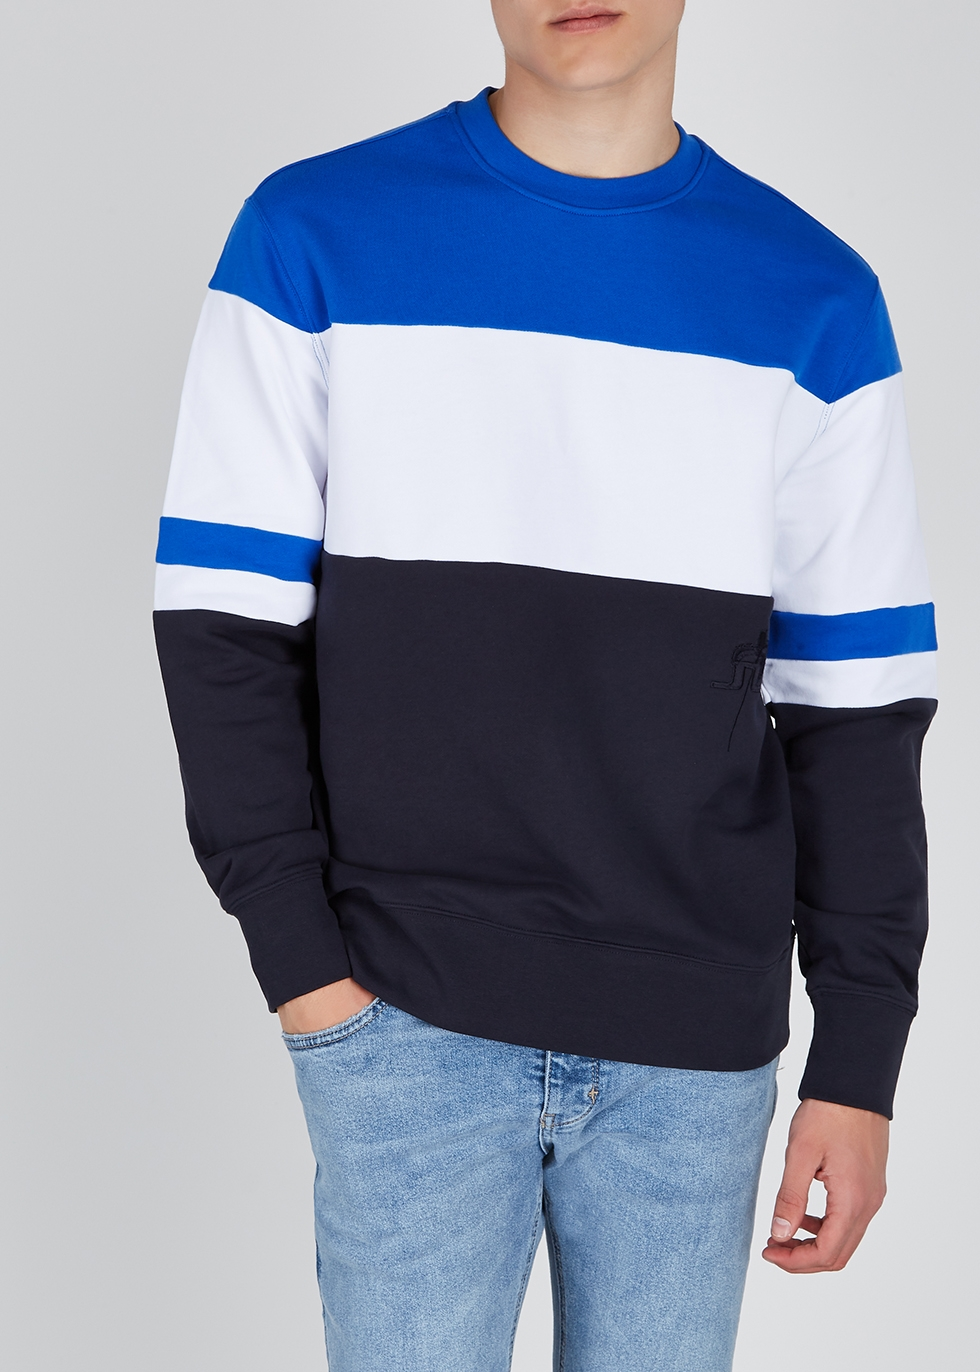 Hurl panelled cotton sweatshirt - J.Lindeberg